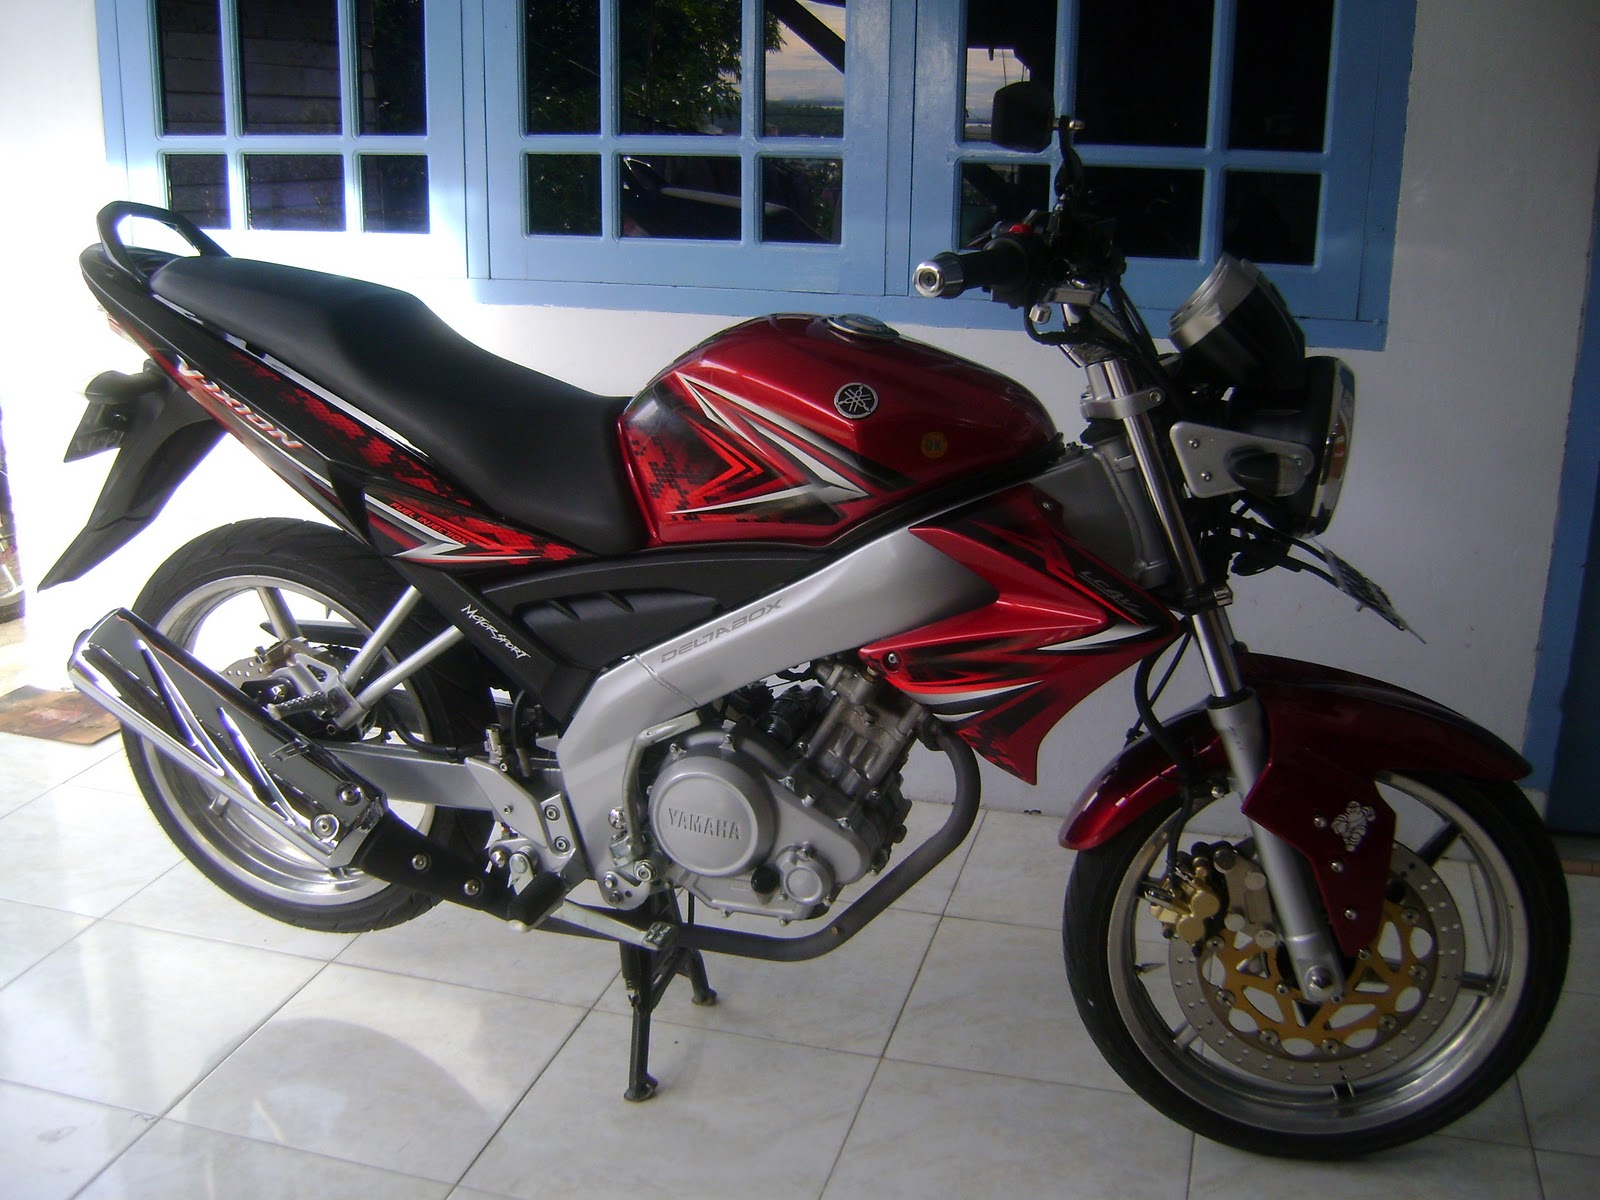 Modif Motor Yamaha King